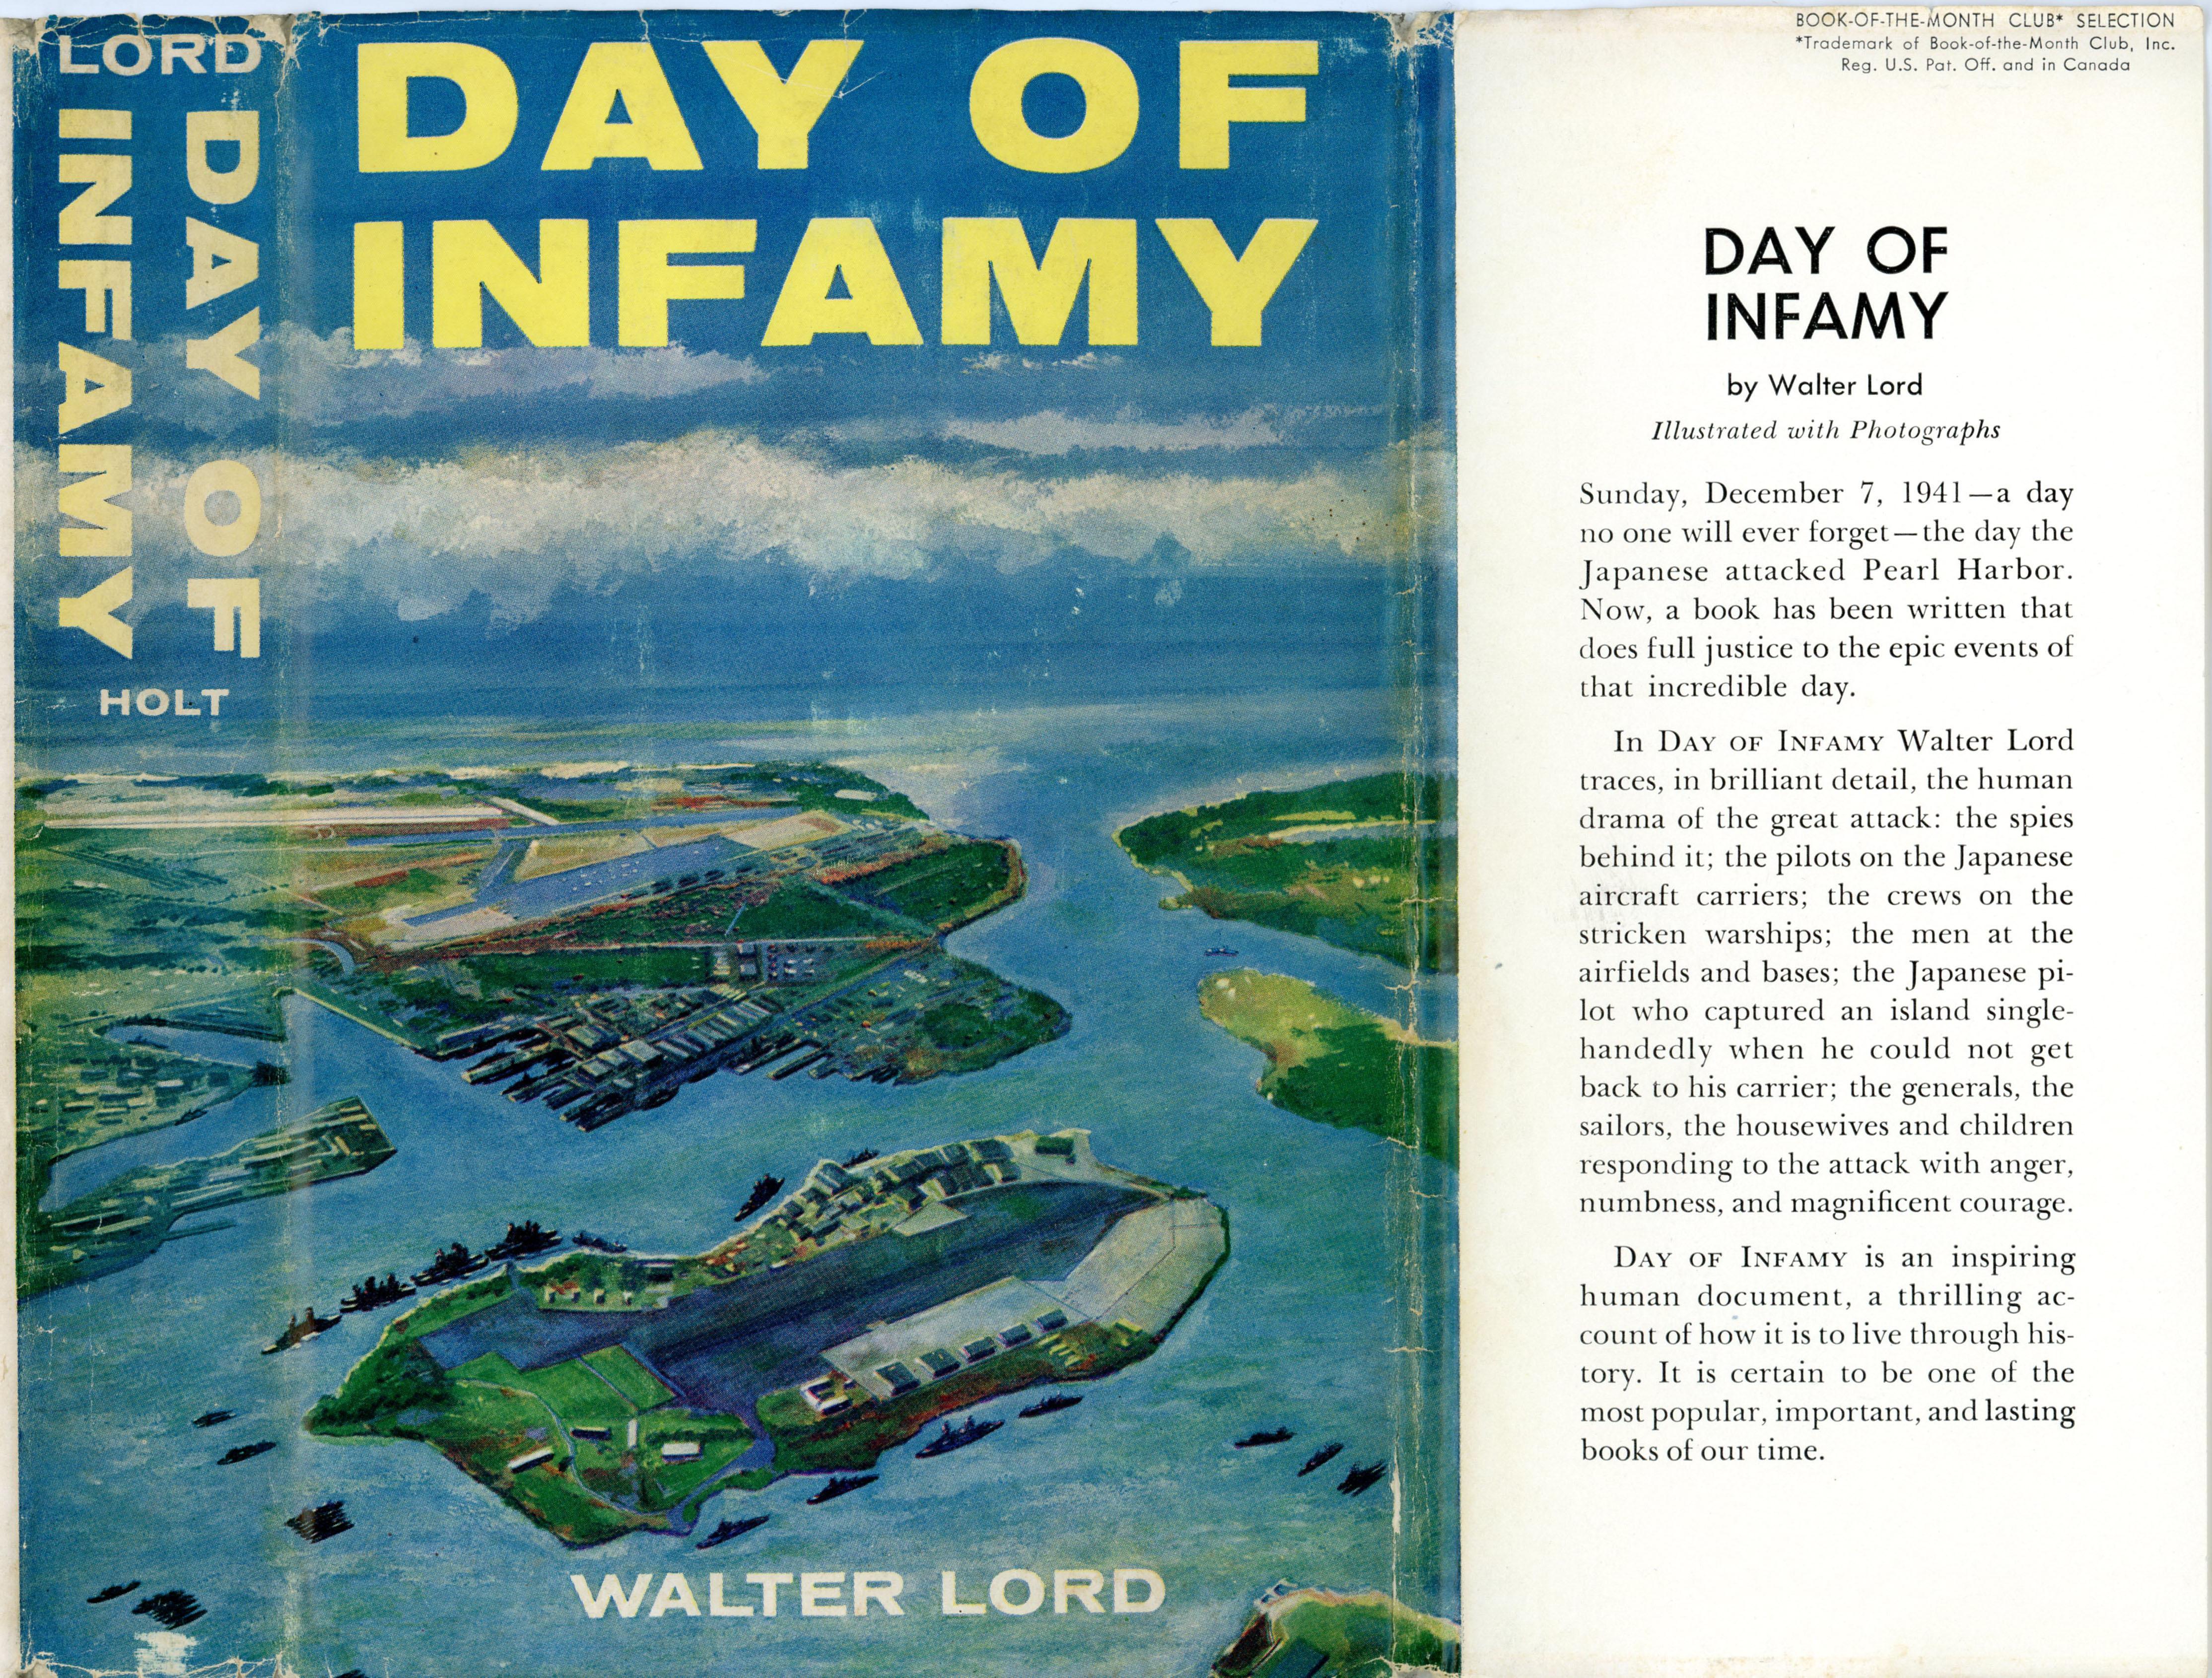 On Pearl Harbor Literary Art And Illustration